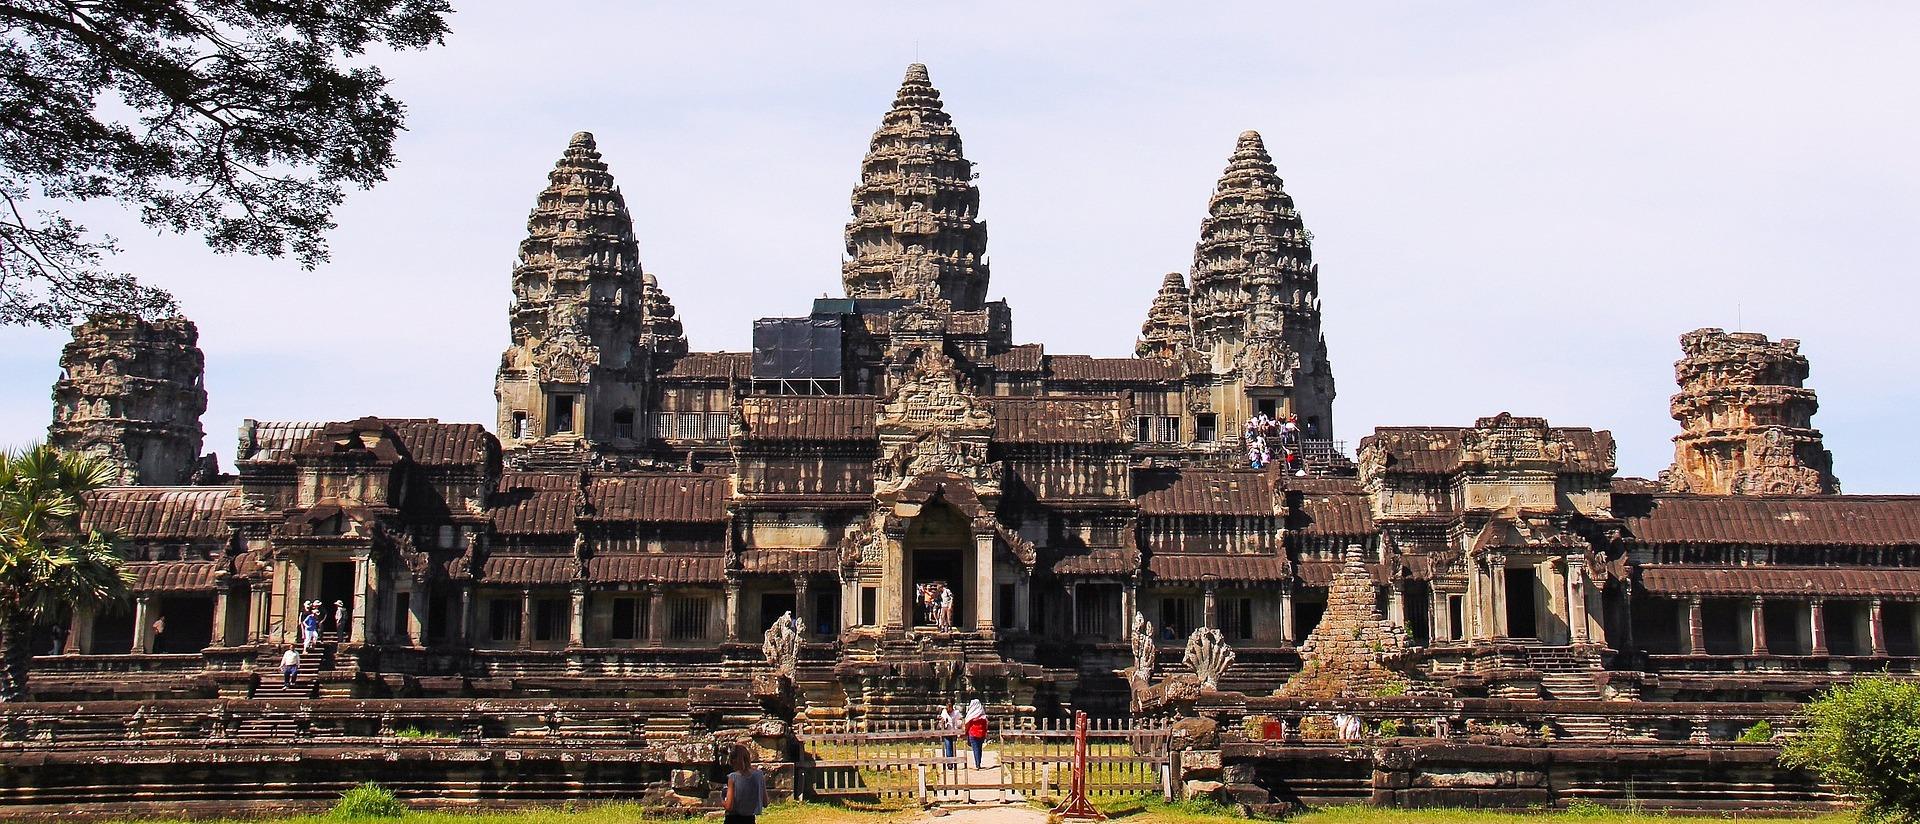 Angkor wat Panorama, Kambodża